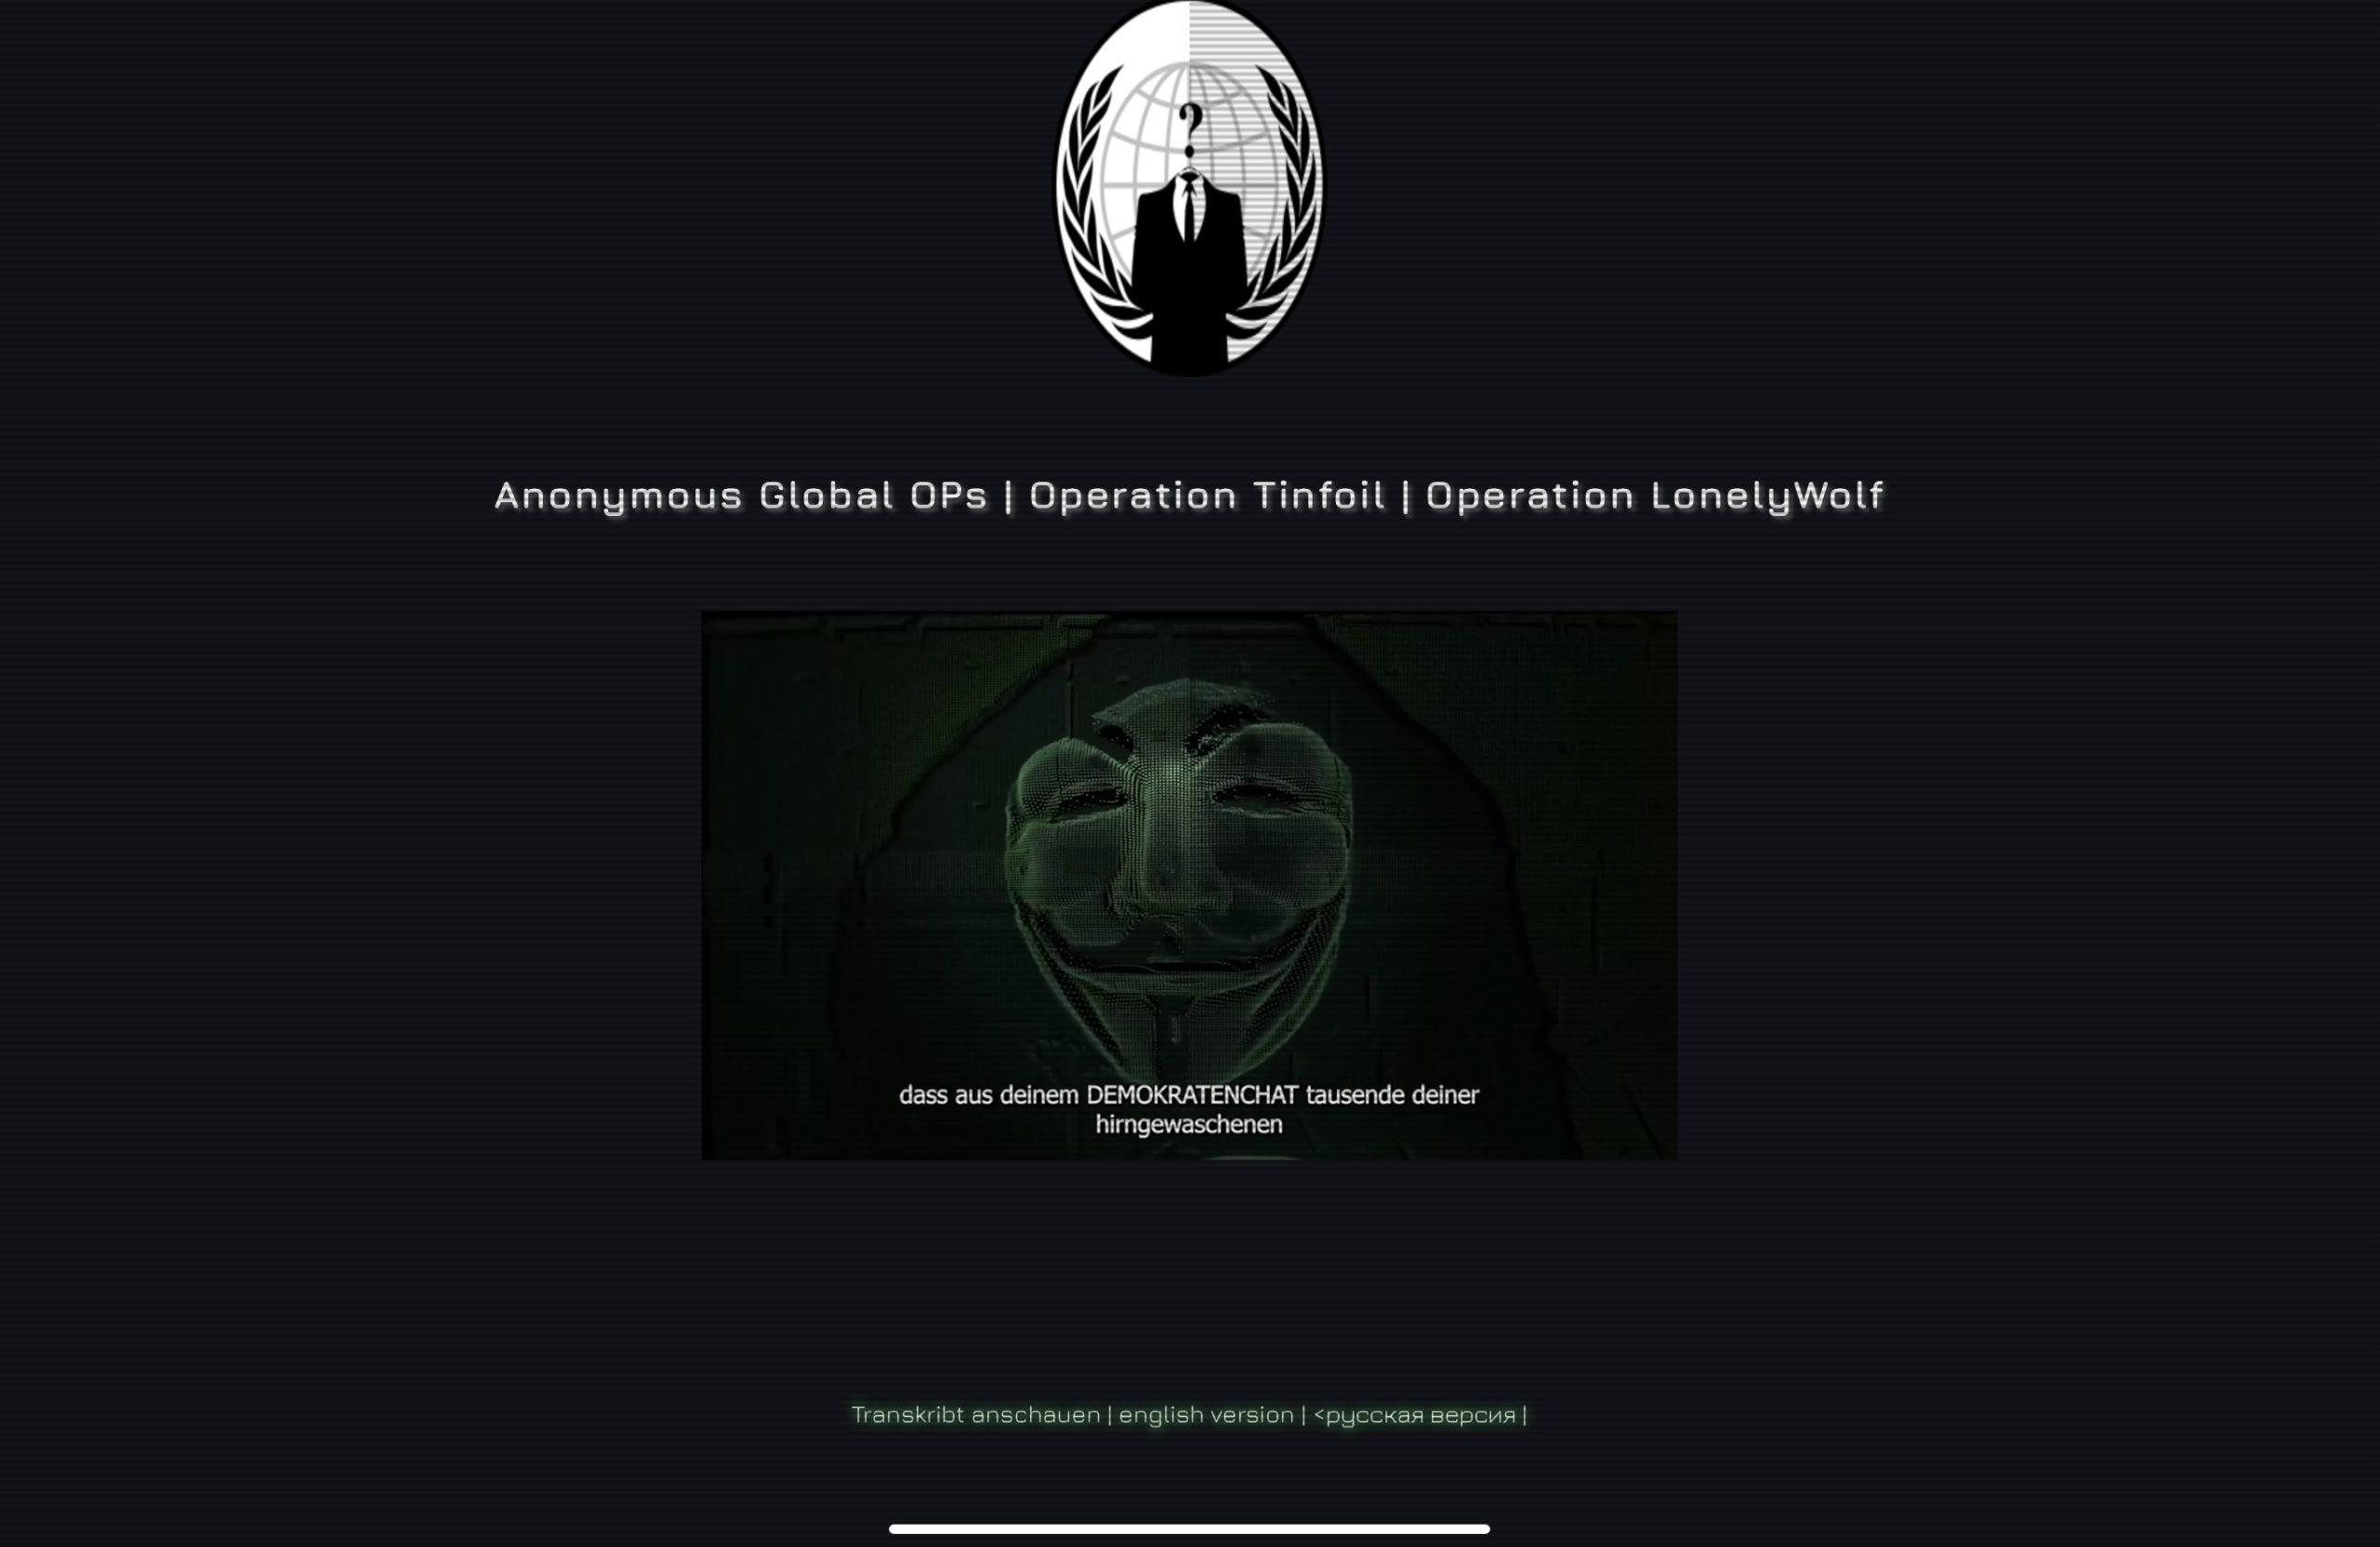 Anonymous übernimmt Attila Hildmann-Webseite und Telegram-Kanäle